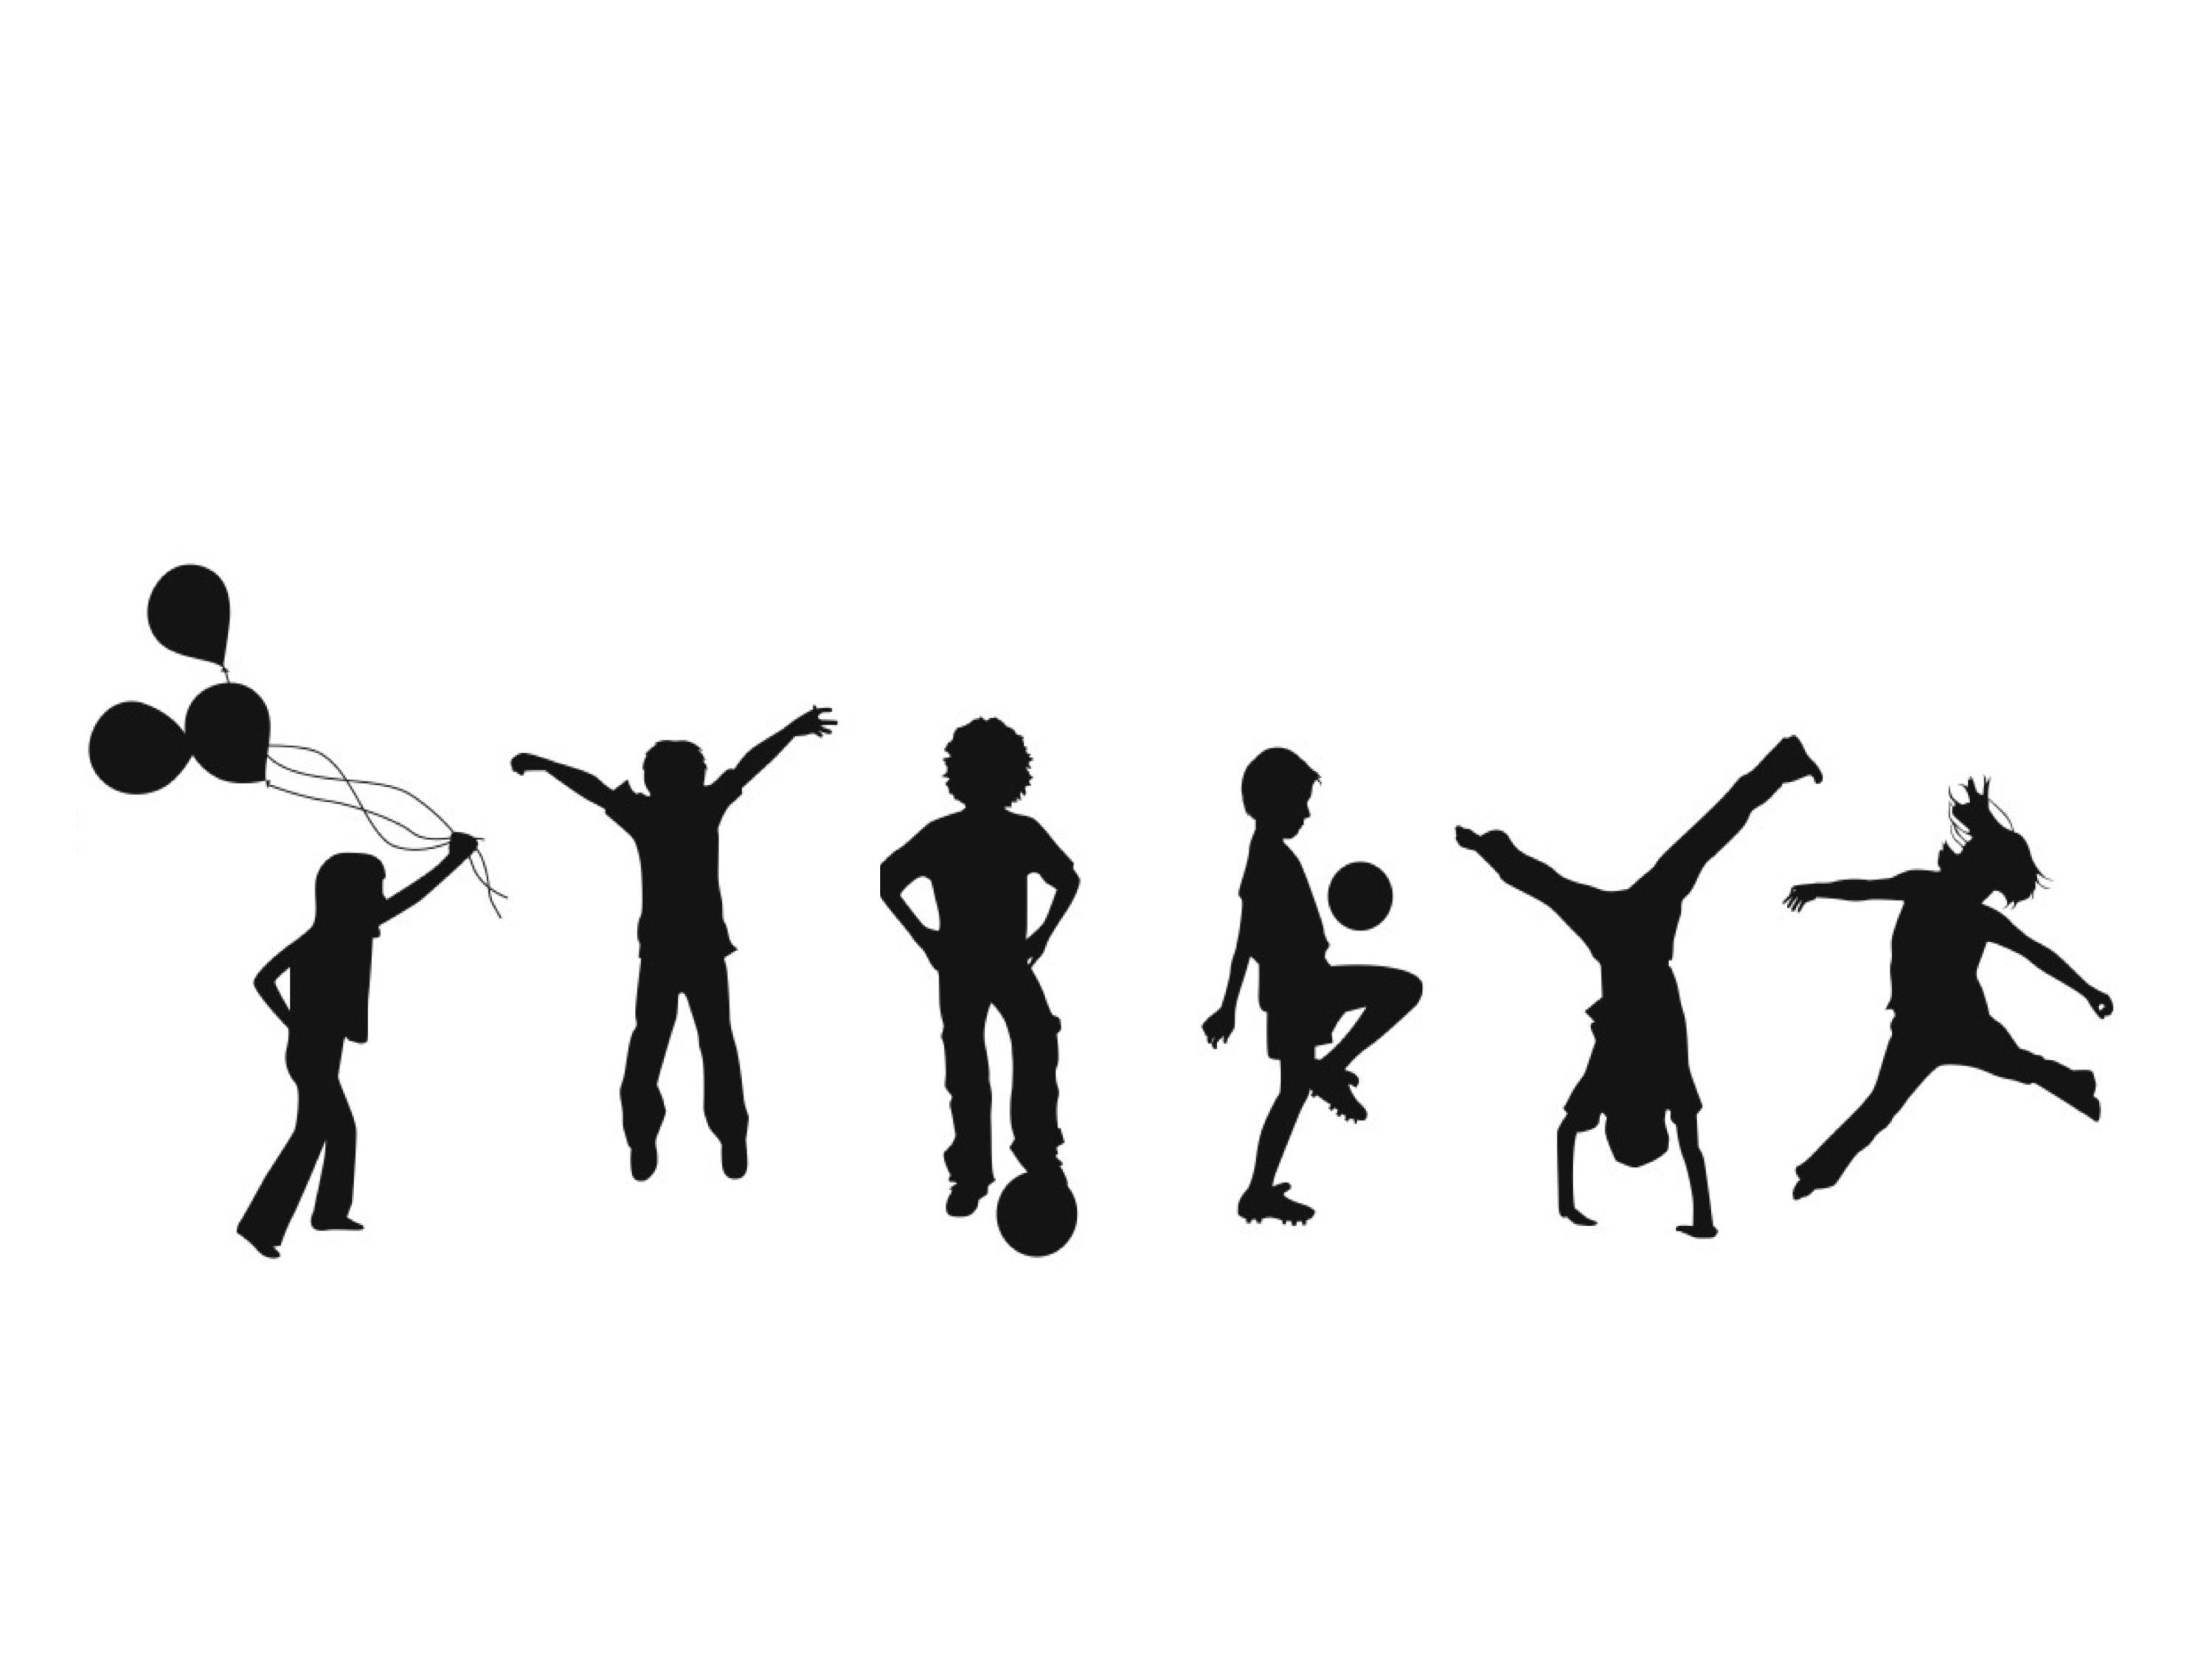 1358810881201797421children Black Jpg 2 999 2 249 Pixels Benefits Of Exercise Multiple Sclerosis Exercise Health App